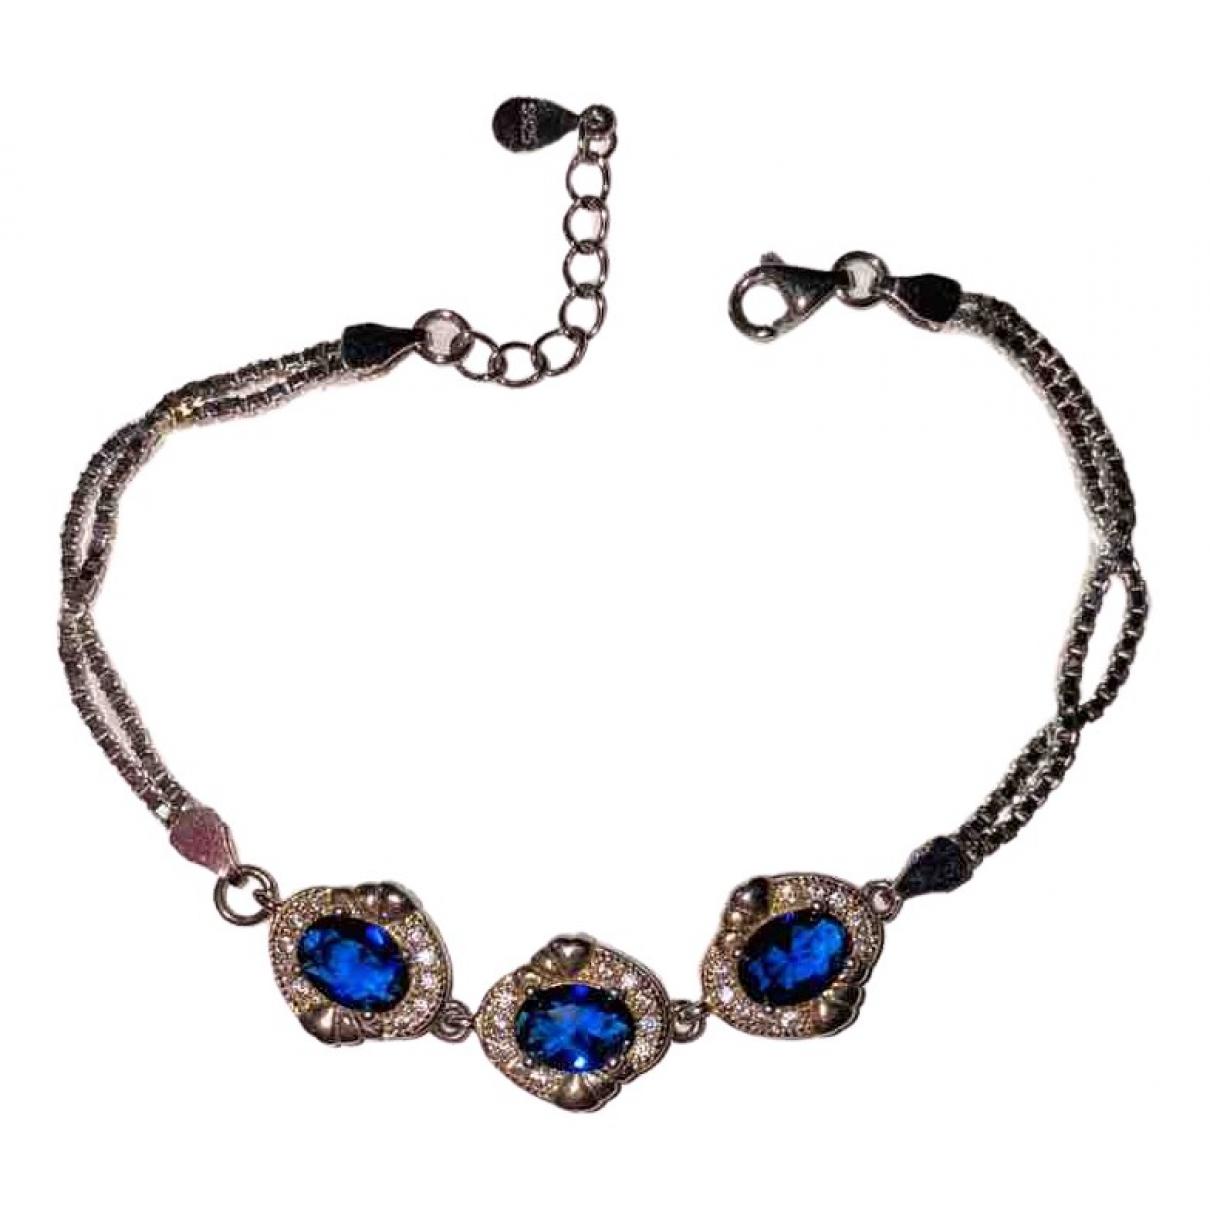 Non Signe / Unsigned Rubis Armband in  Blau Silber